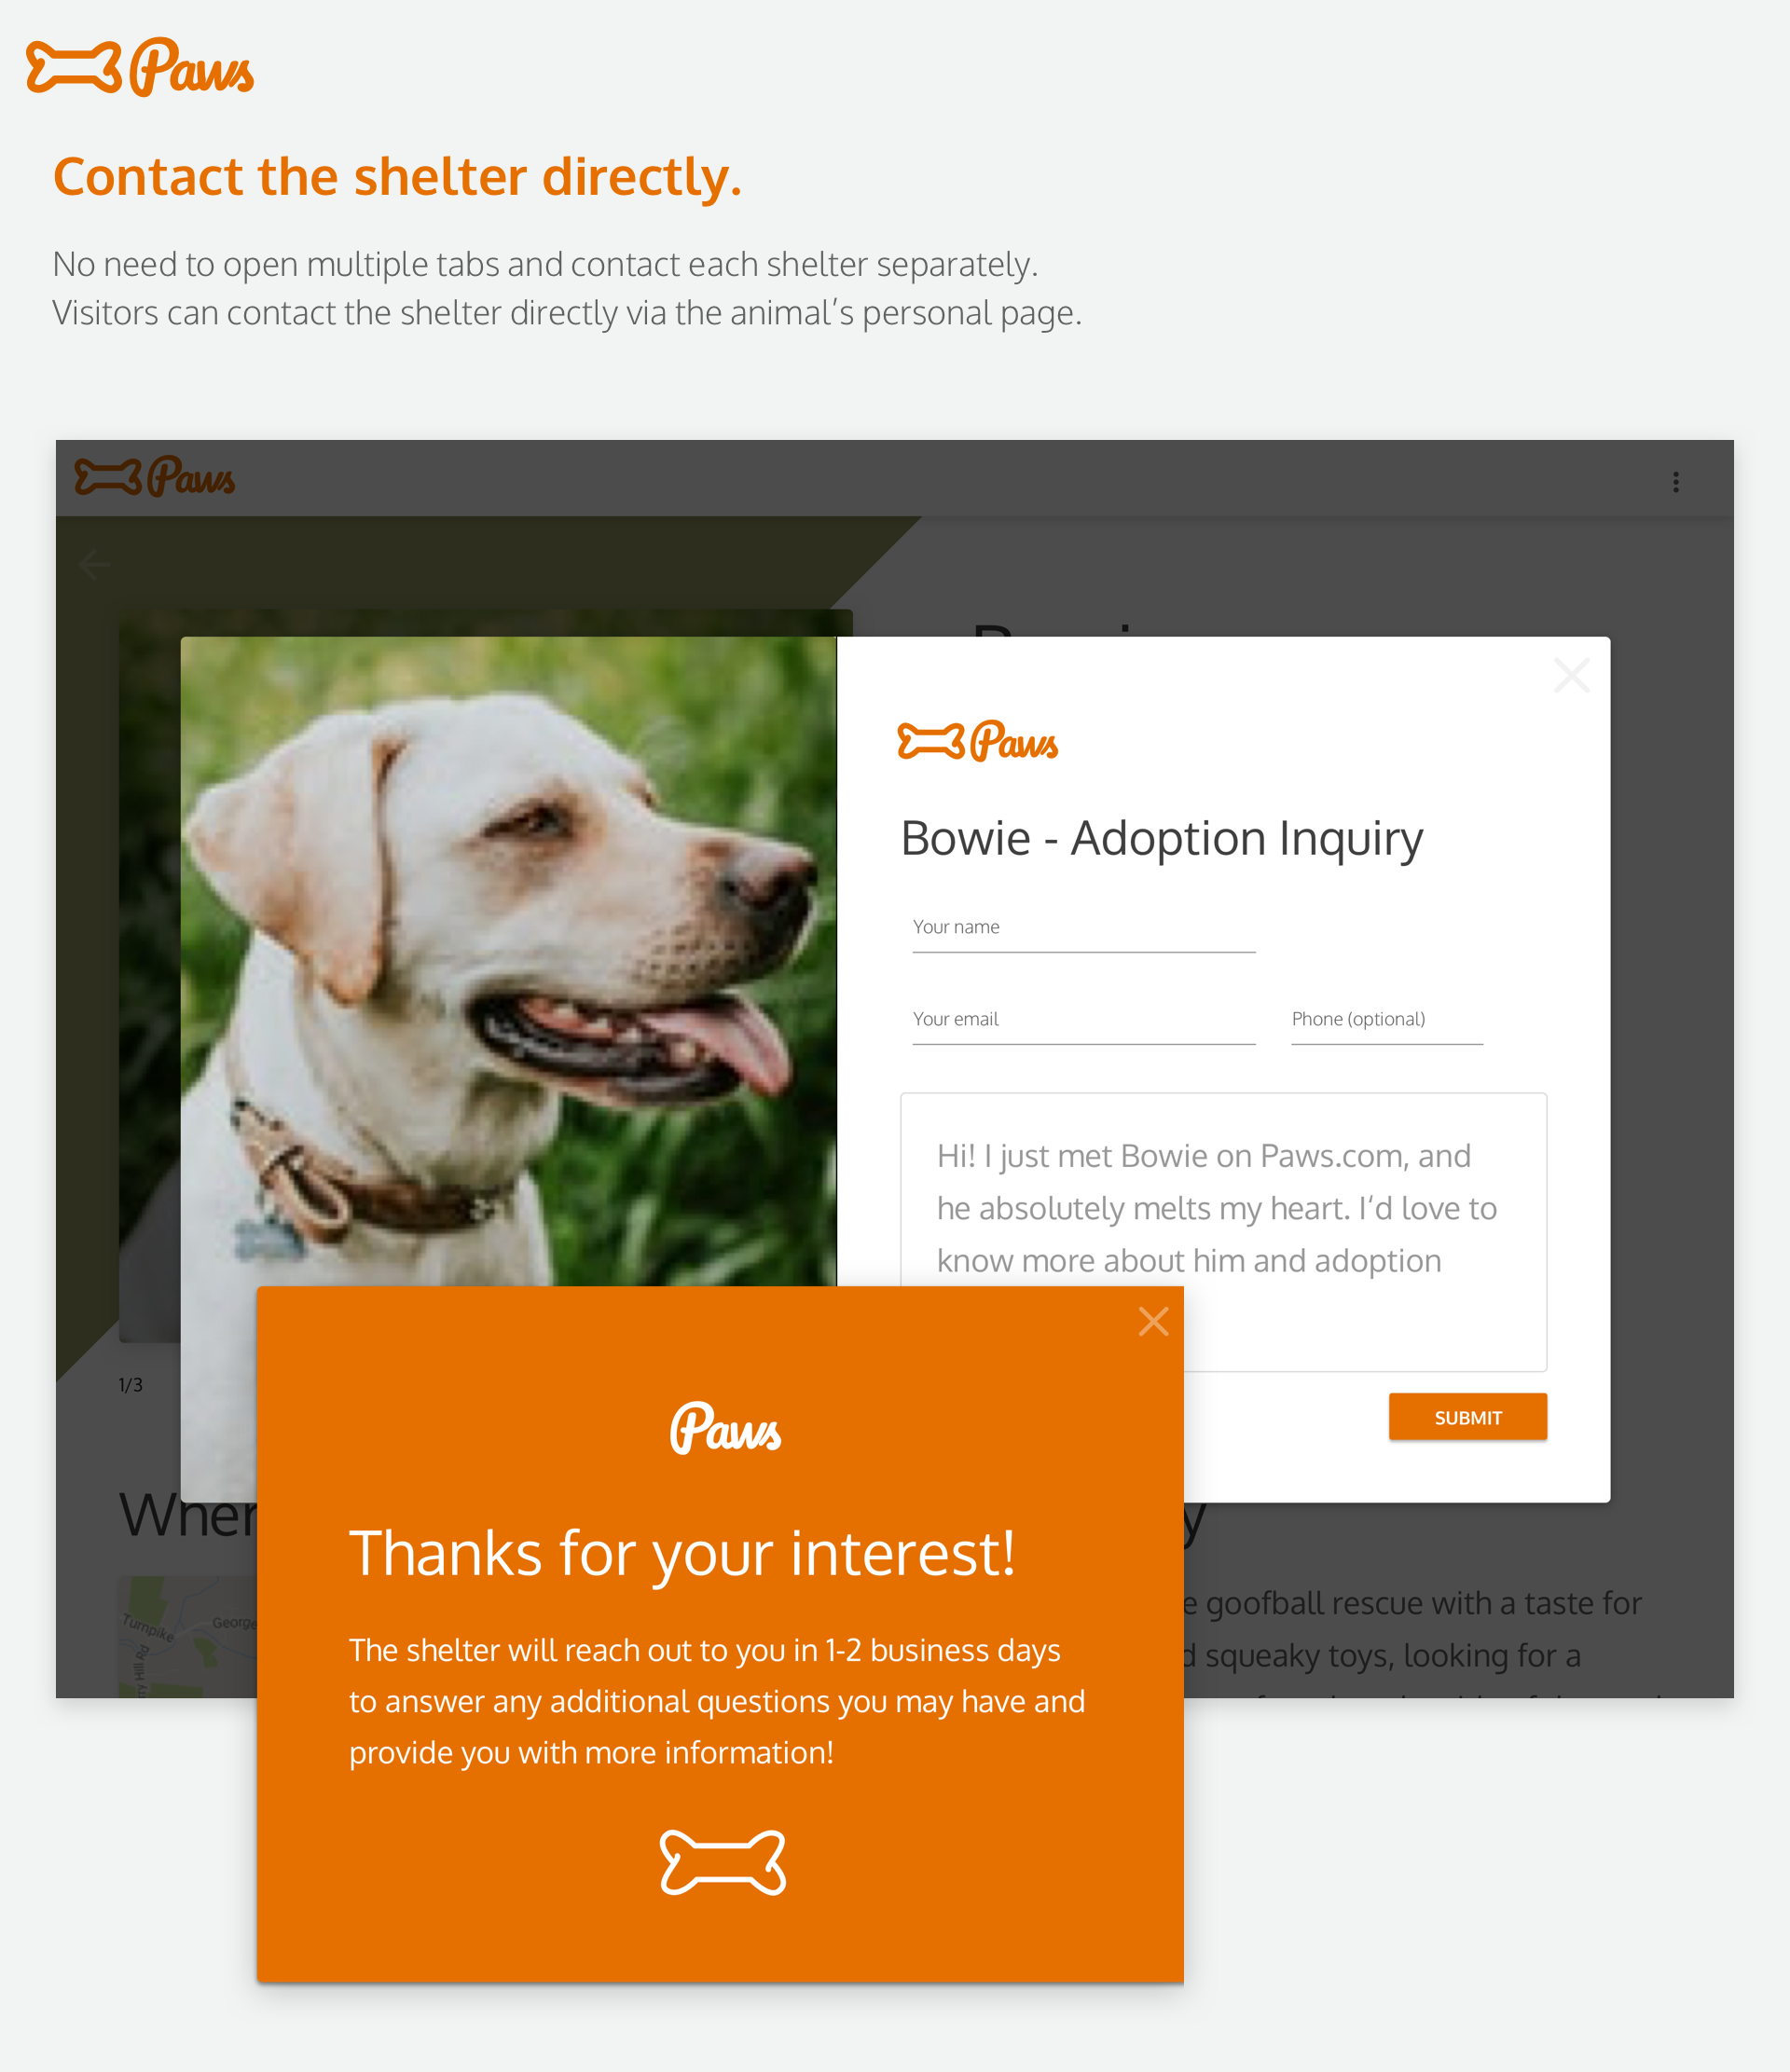 emily-ziegelmeyer-design-adoption-title copy 7.png